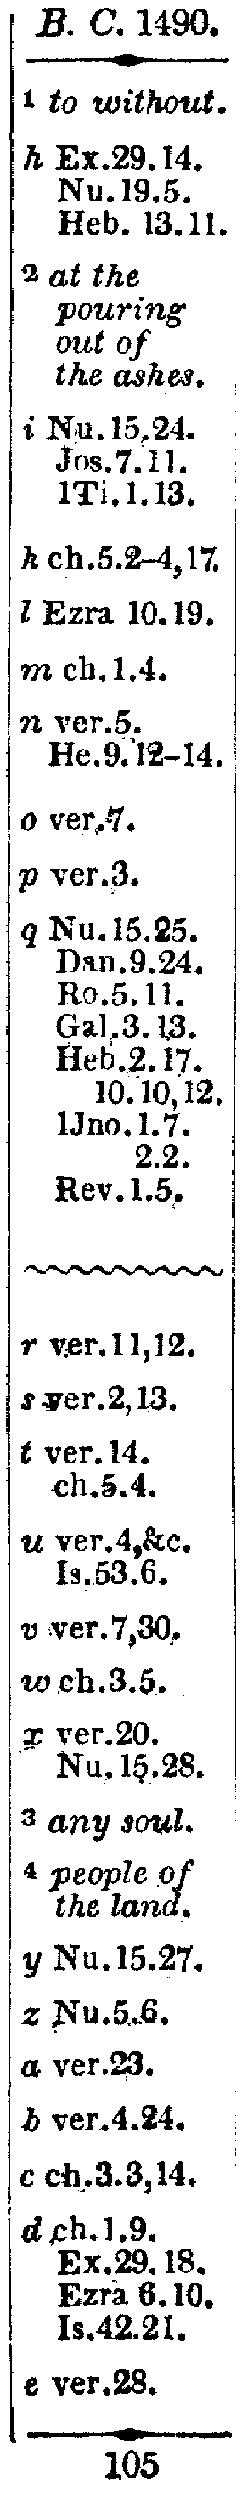 [merged small][merged small][ocr errors][merged small][merged small][ocr errors][ocr errors][ocr errors][ocr errors][merged small][merged small][ocr errors][merged small][merged small][merged small][ocr errors][merged small][ocr errors][ocr errors][ocr errors][ocr errors]